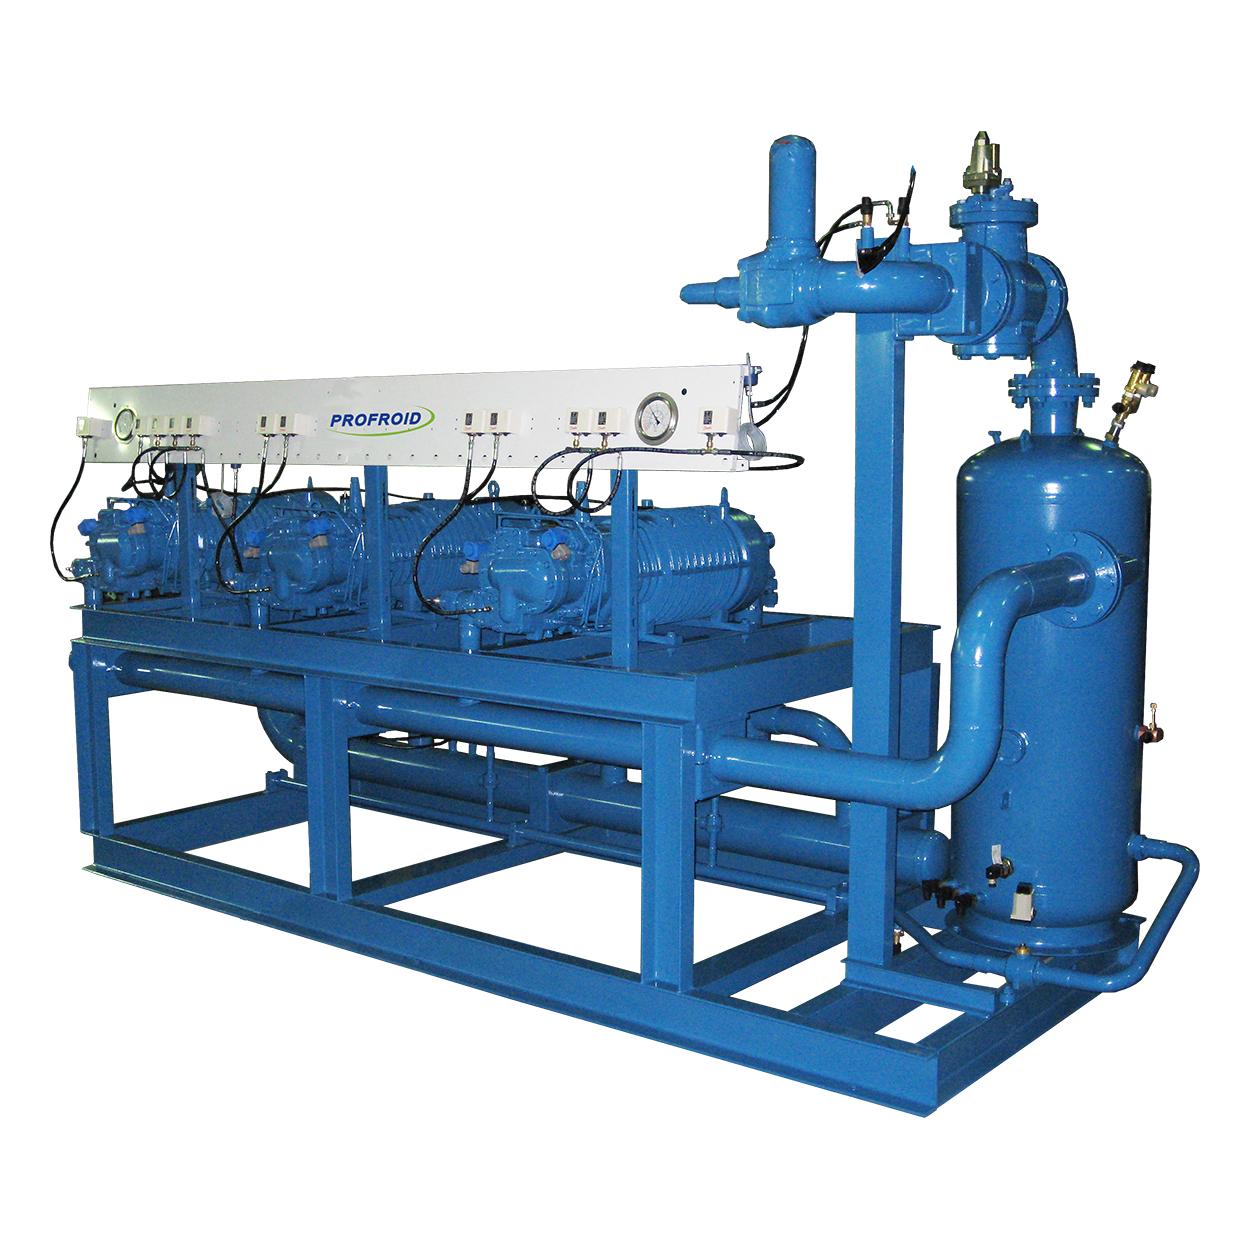 Profroid-SHV-Vis-compressor-rack